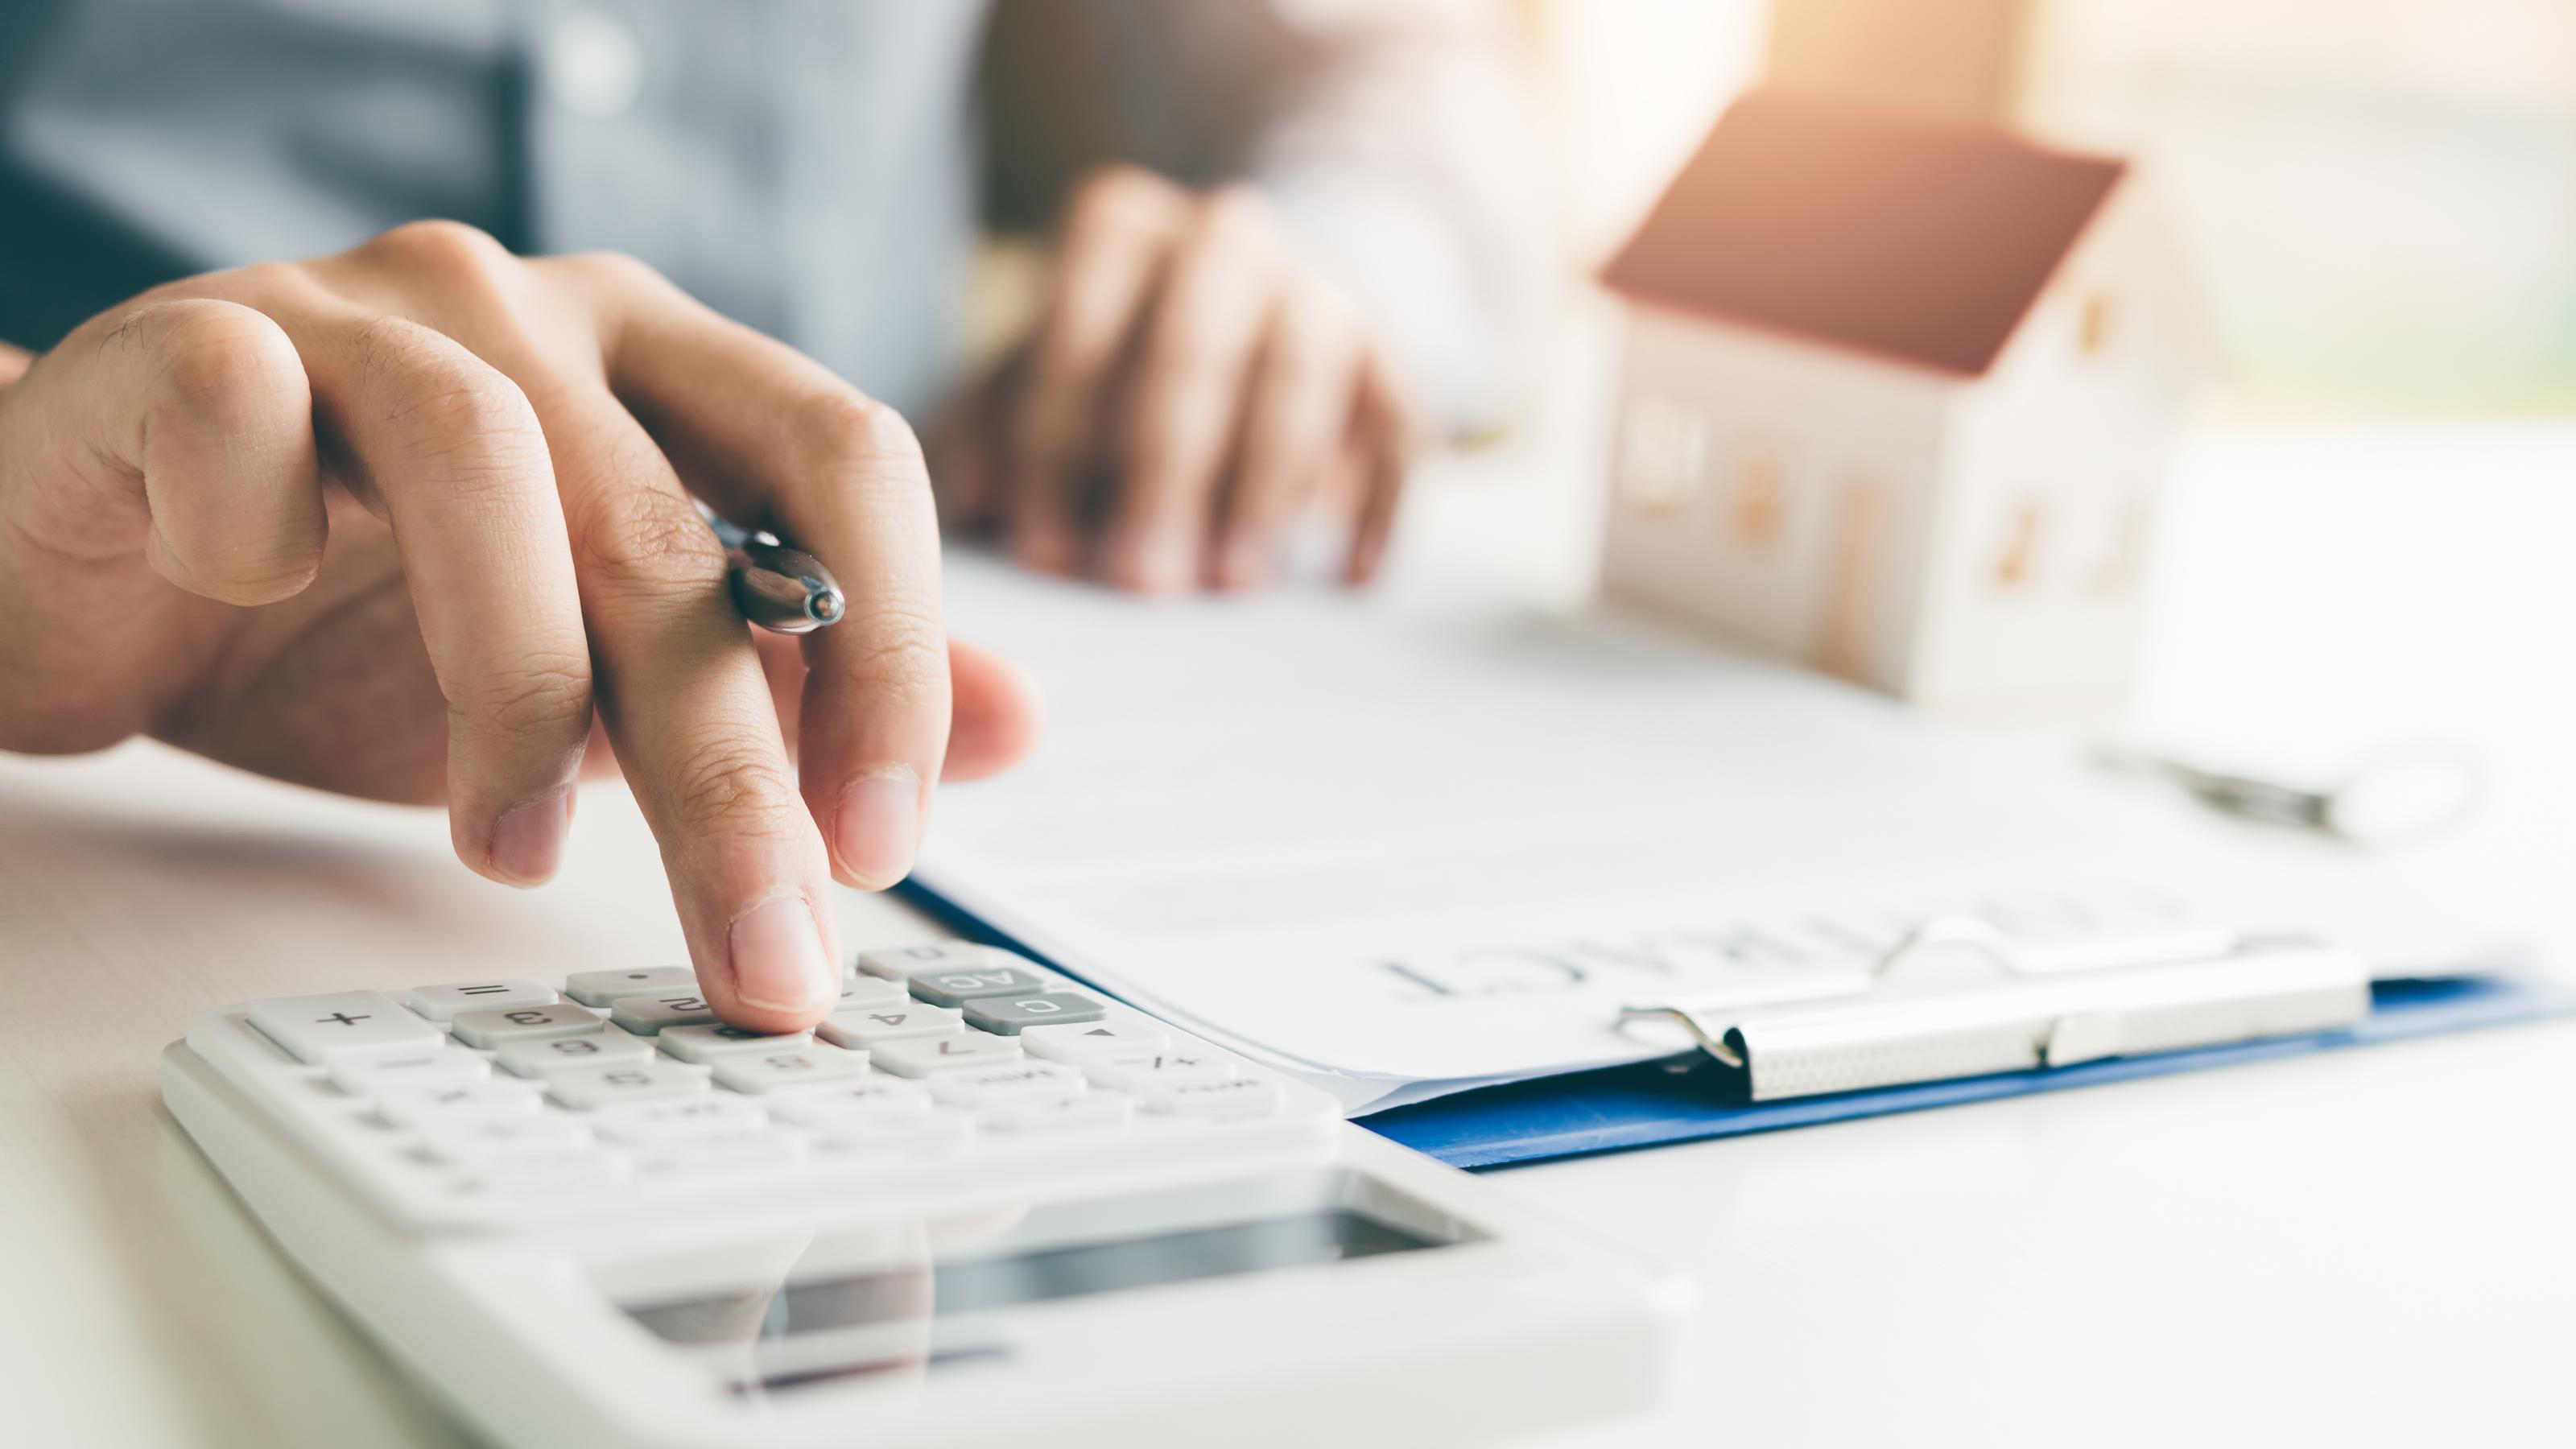 cnn.com - Jennifer Yellin - How to refinance your mortgage | CNN Underscored